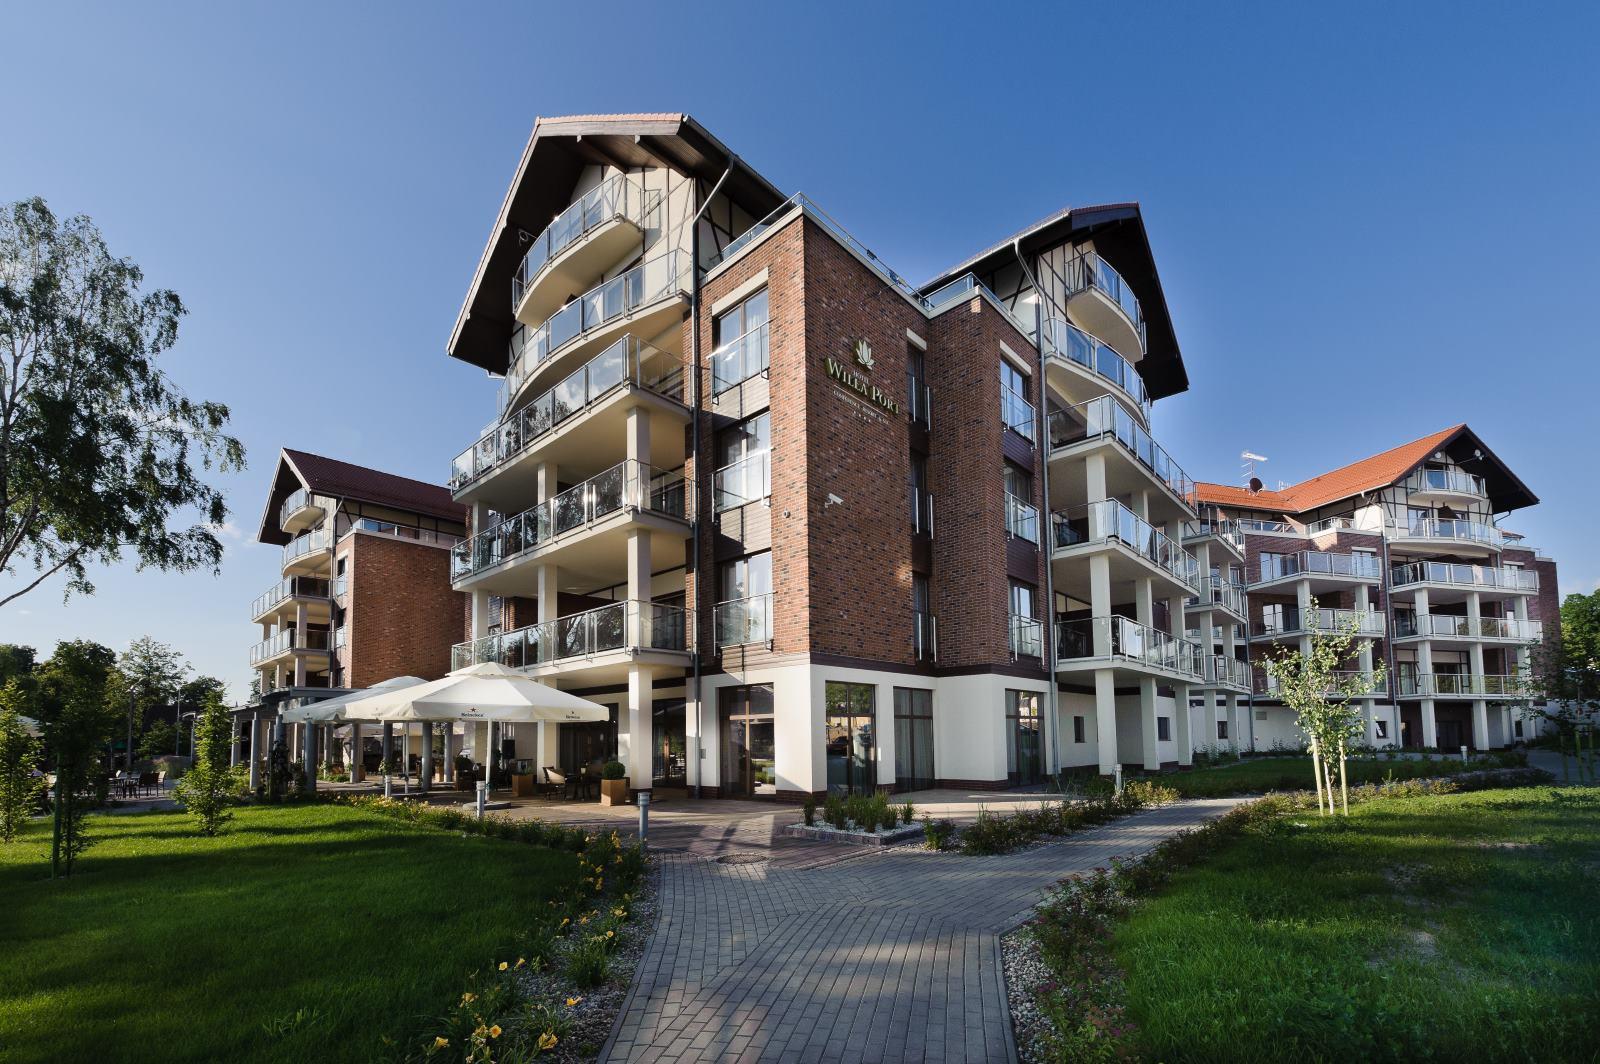 Willa Port Ostróda - Hotel SPA na Mazurach